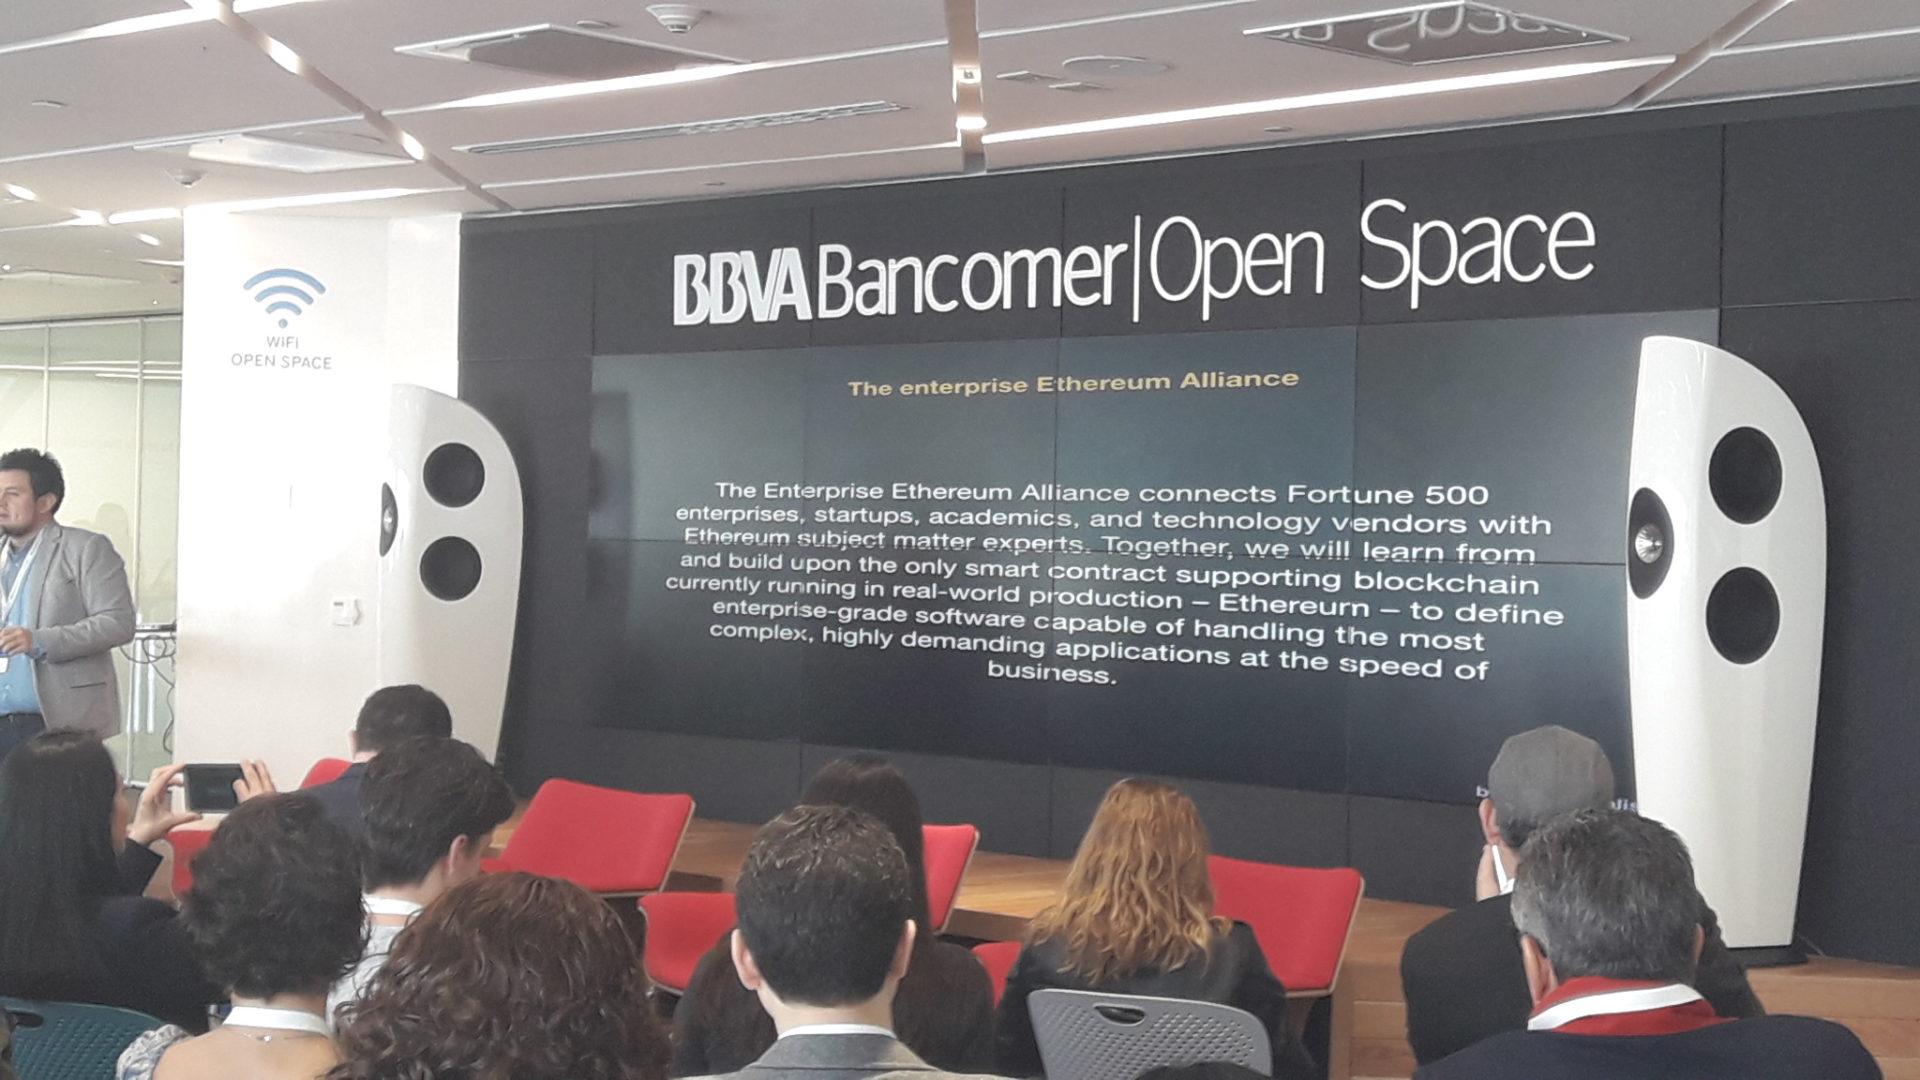 Exposición en BBVA Bancomer | Open Space durante la sesión de Open Talks